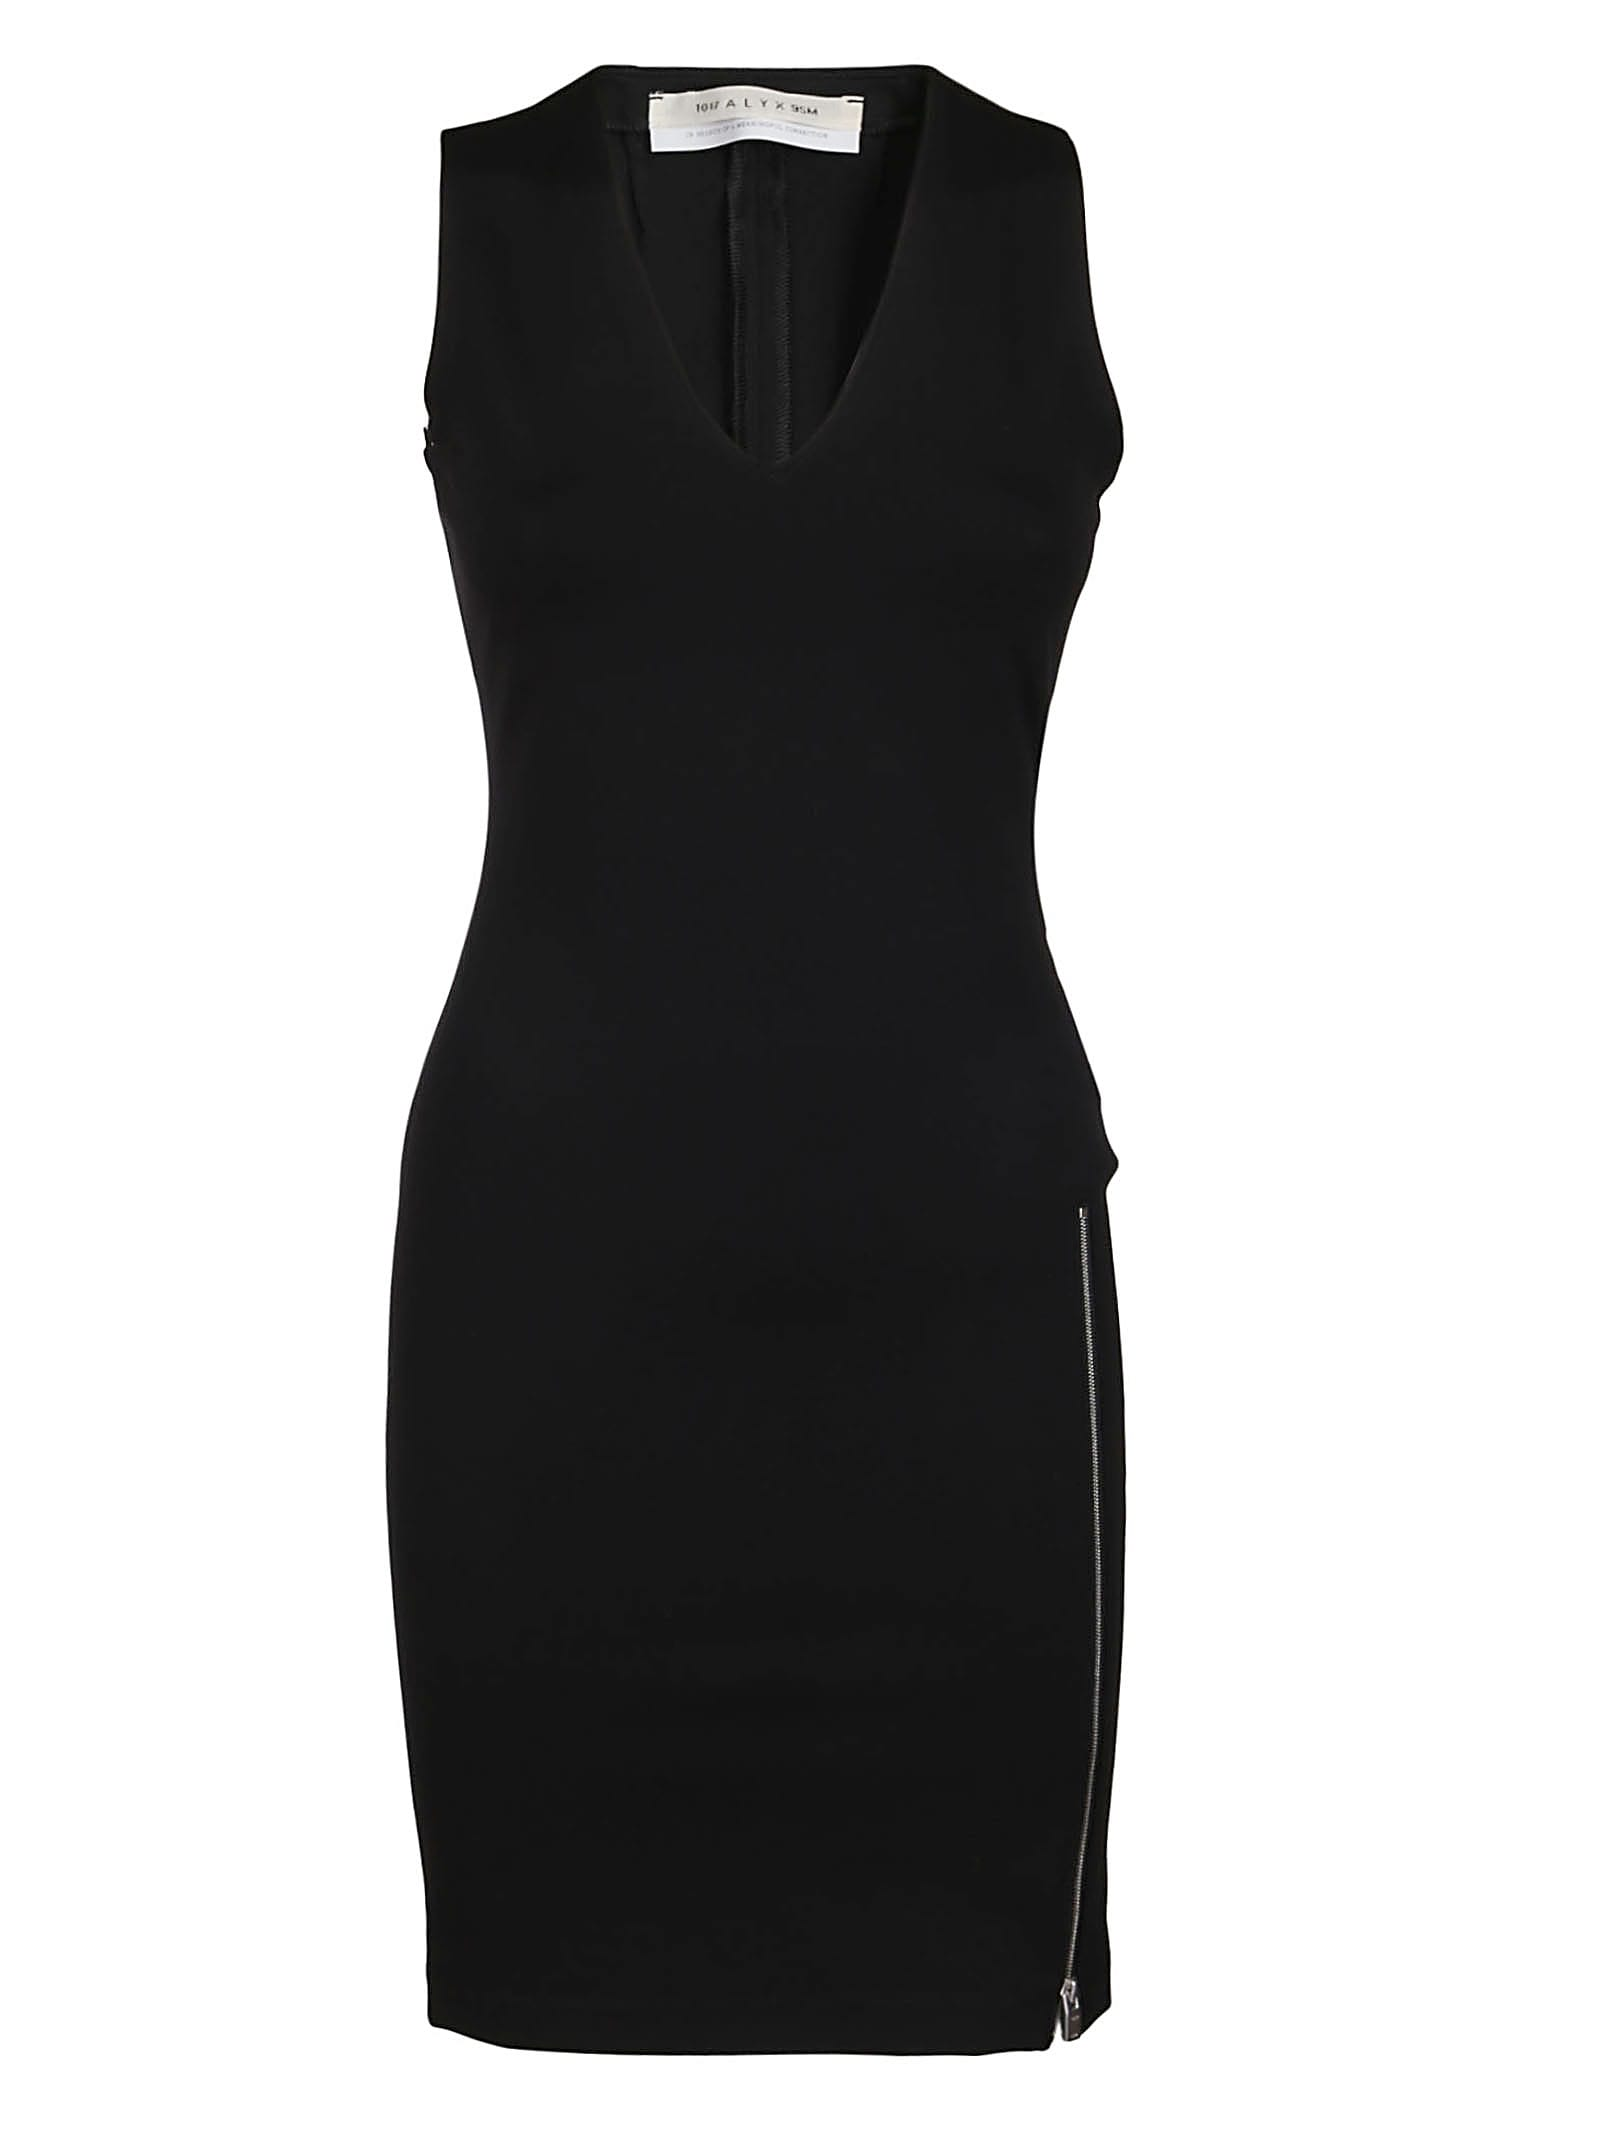 Alyx BLACK VISCOSE BLEND DRESS